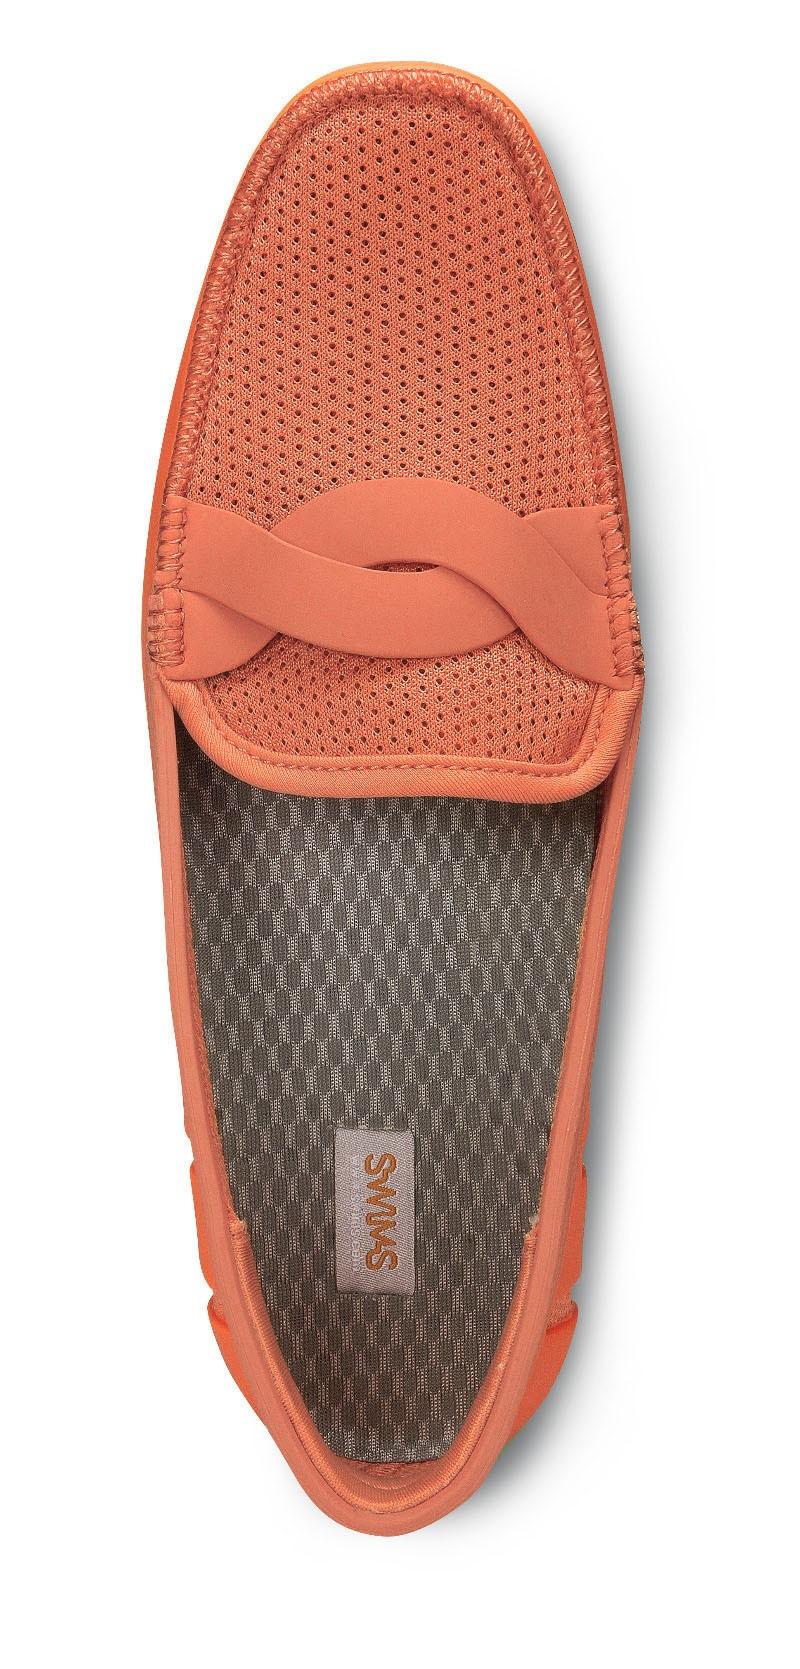 Мокасины Swims Braid Front, коралловые